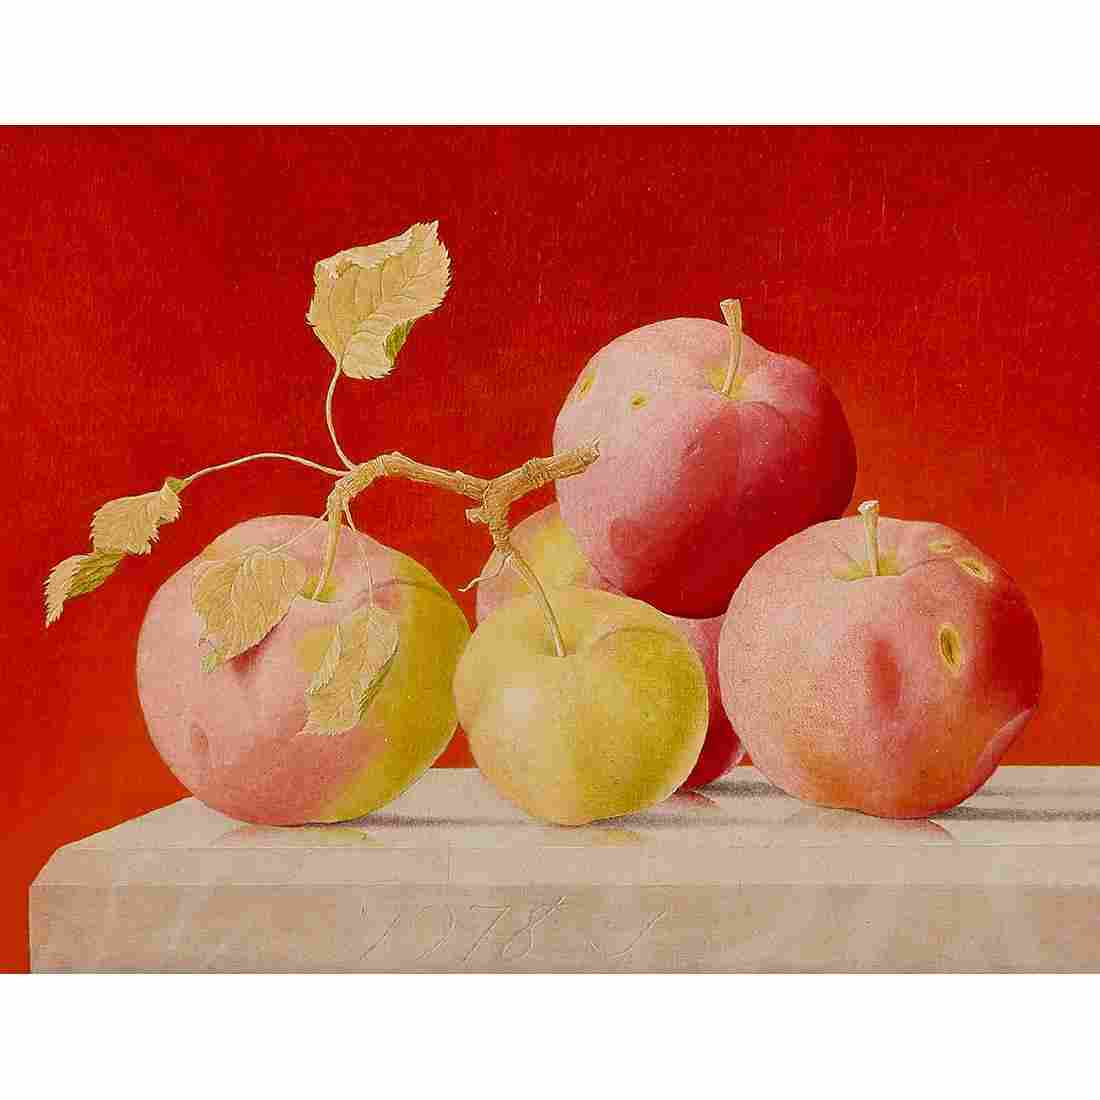 John Wilde, Early Red-Bird, 1978